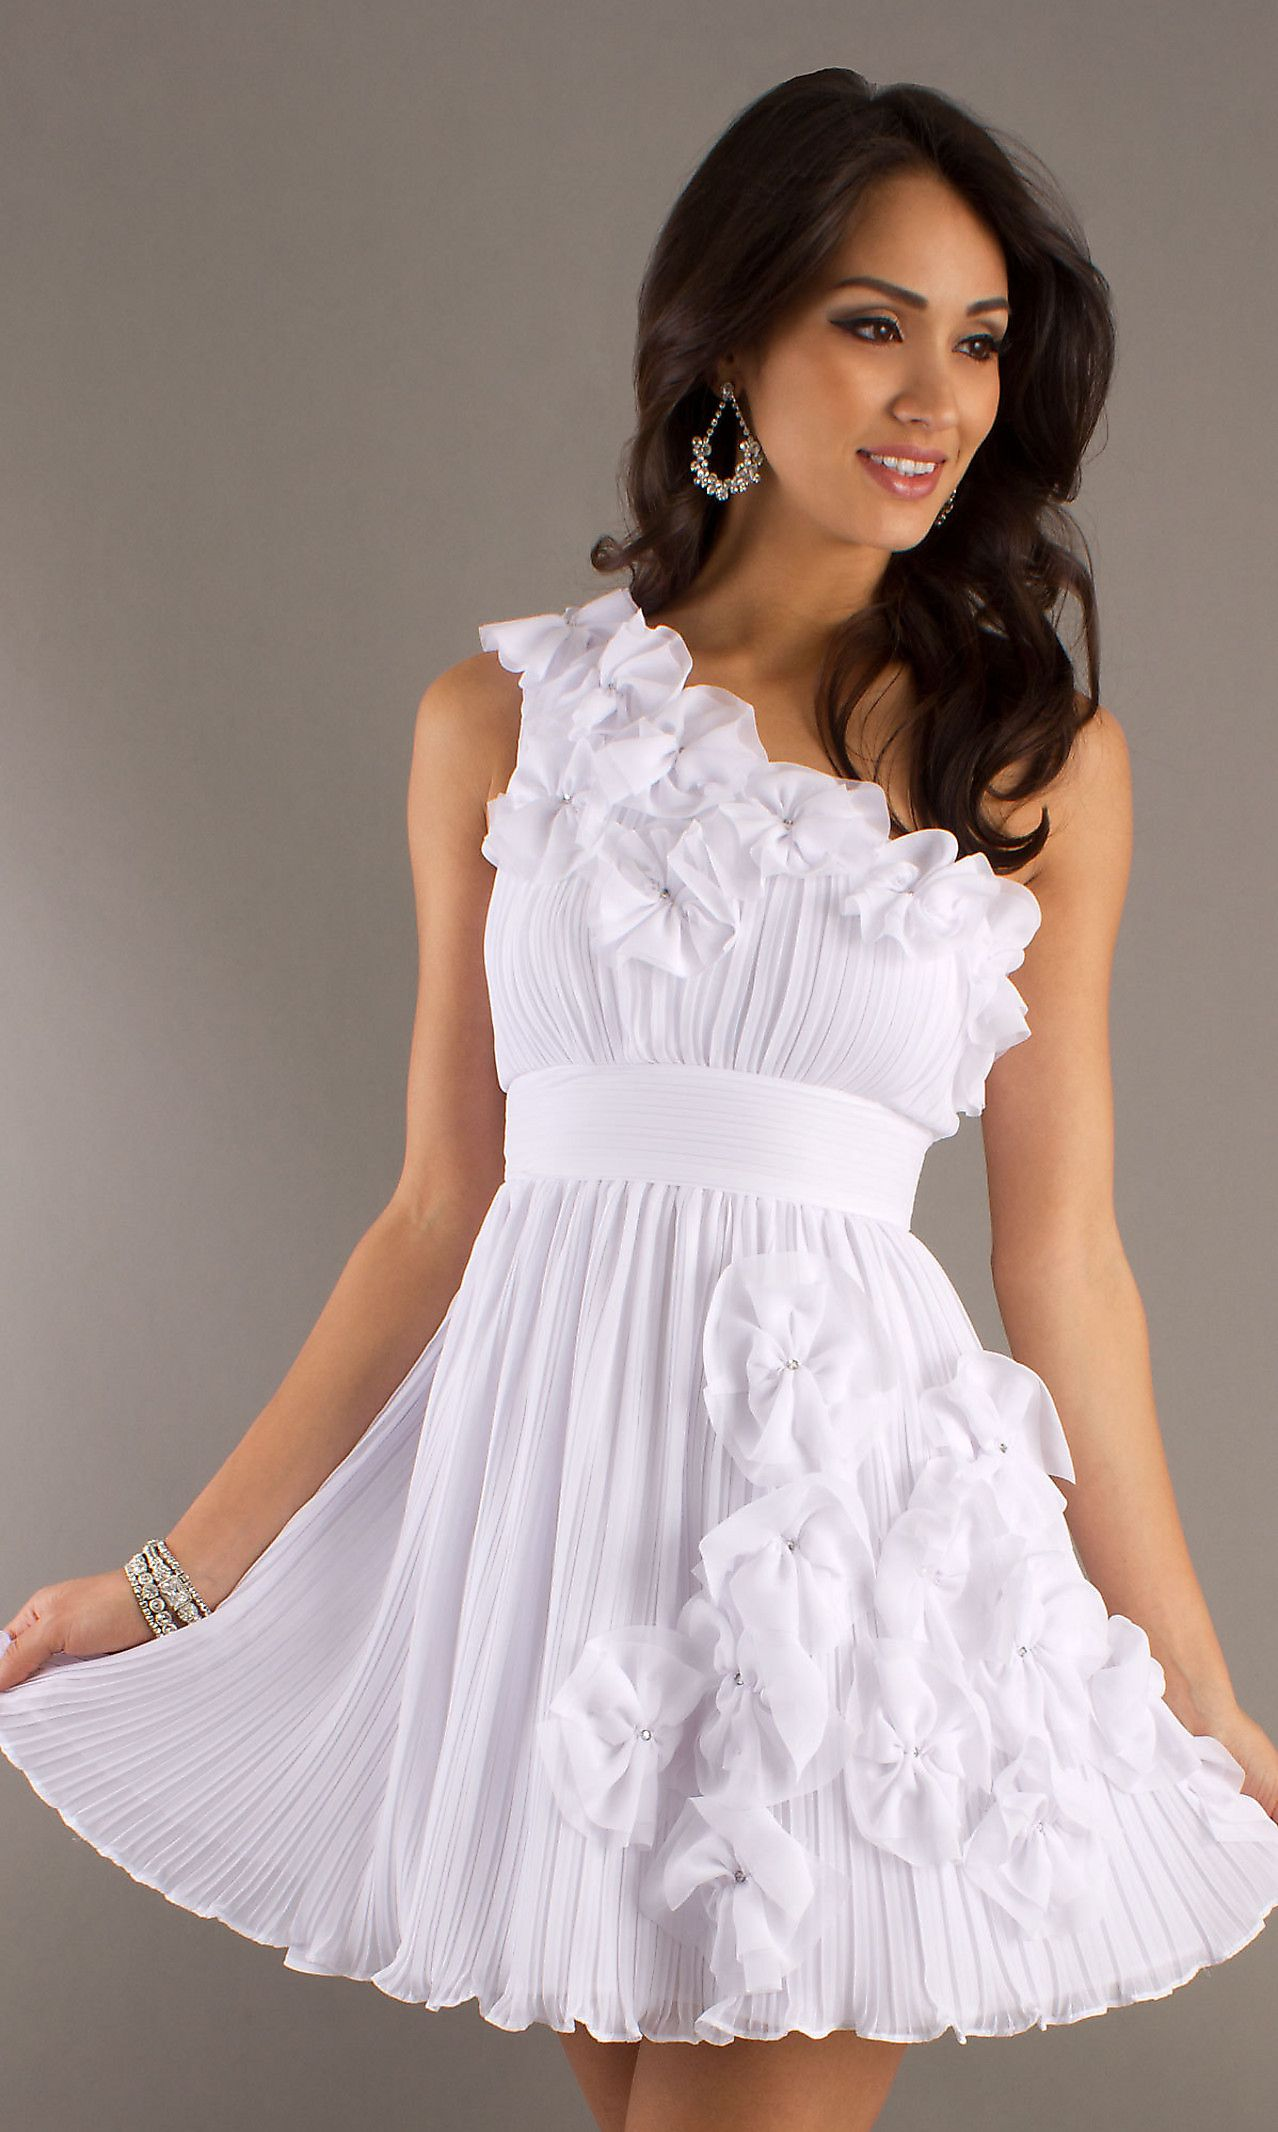 """Short One Shoulder Dress XO-6221AHC1""    Cute for a wedding reception party dress."